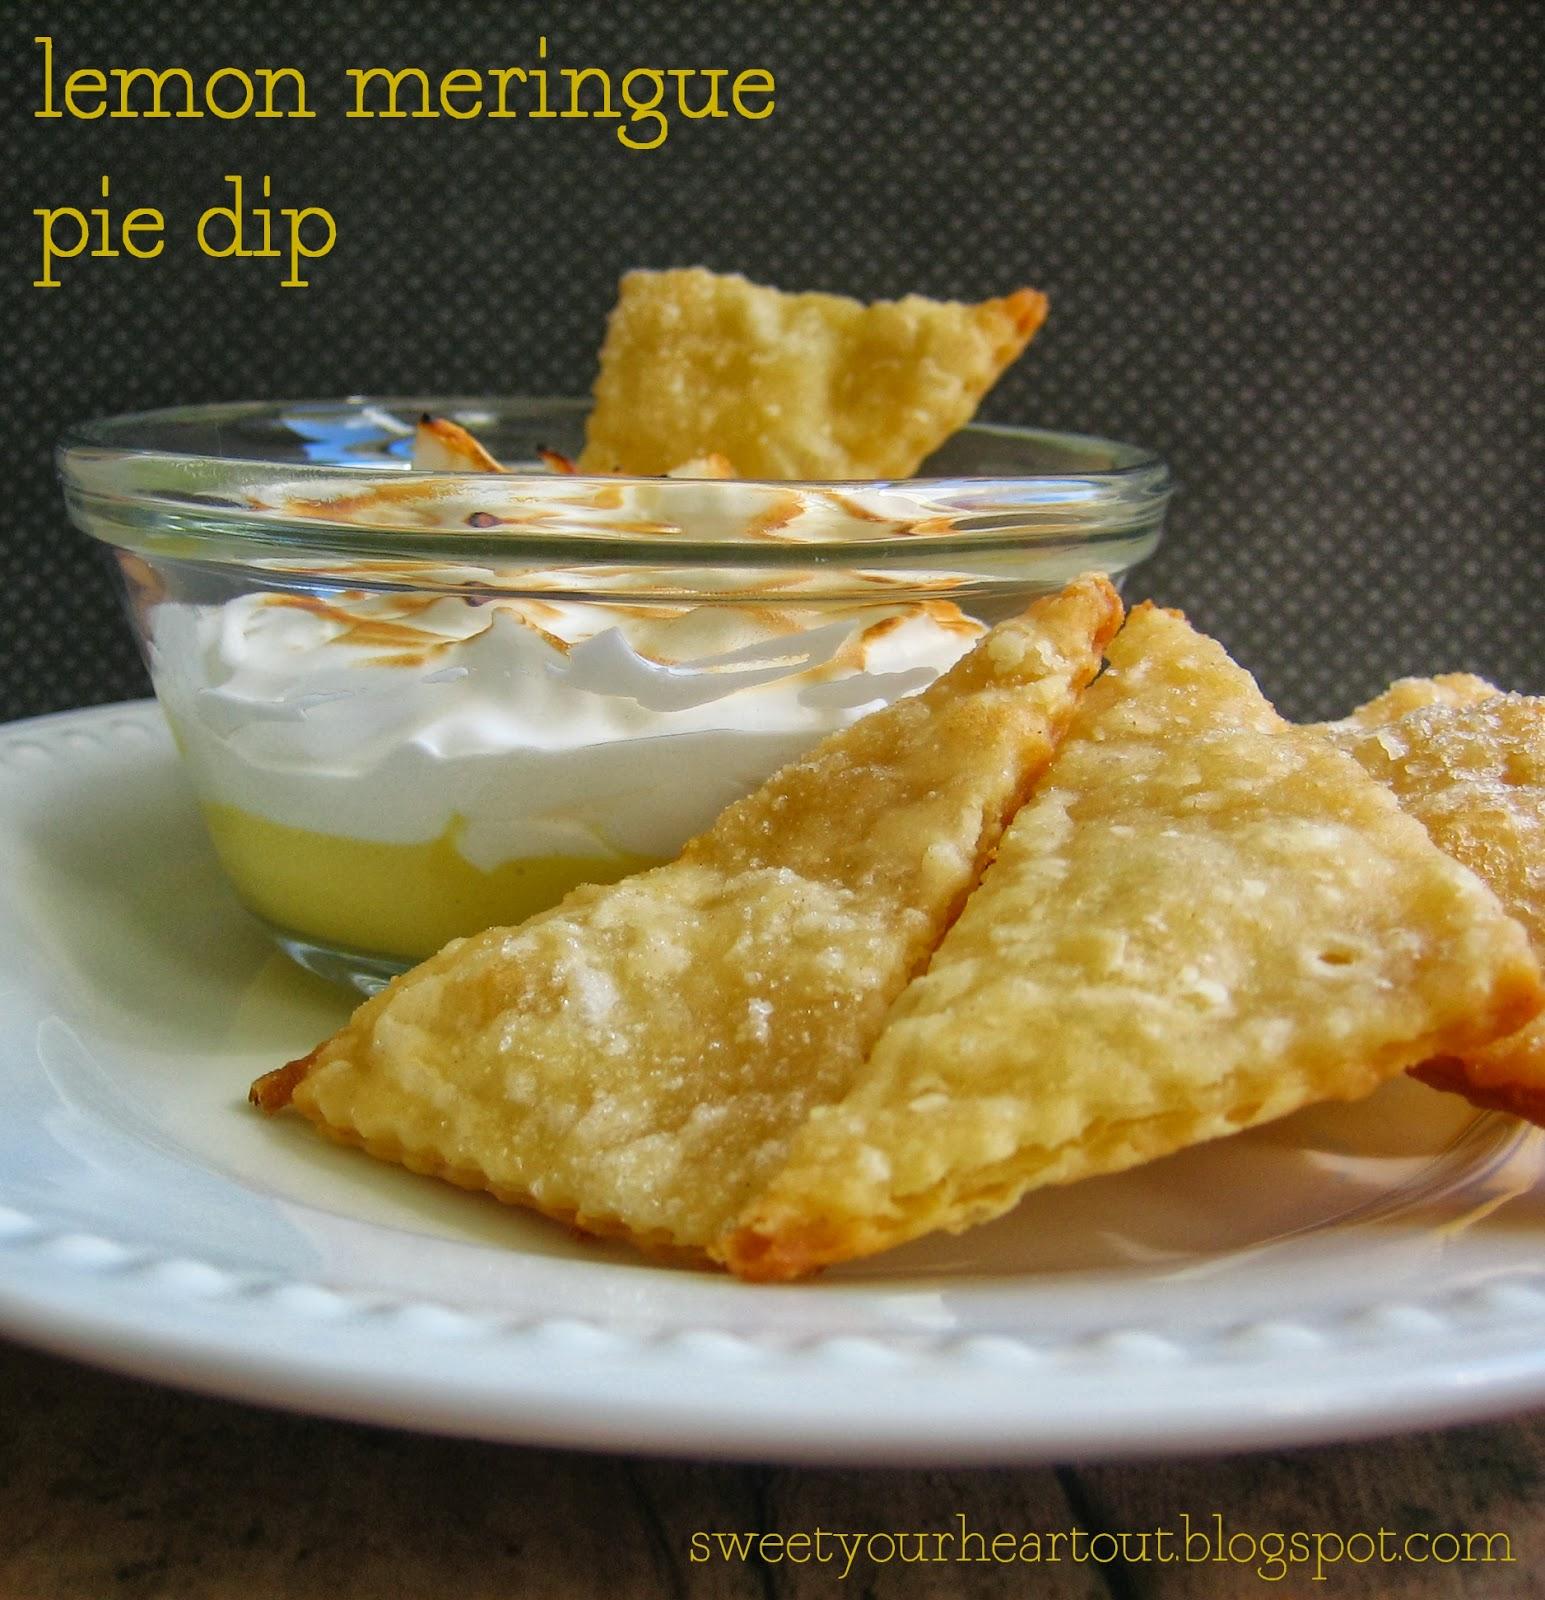 Sweet your heart out lemon meringue pie dip for Lemon meringue pie with graham cracker crust